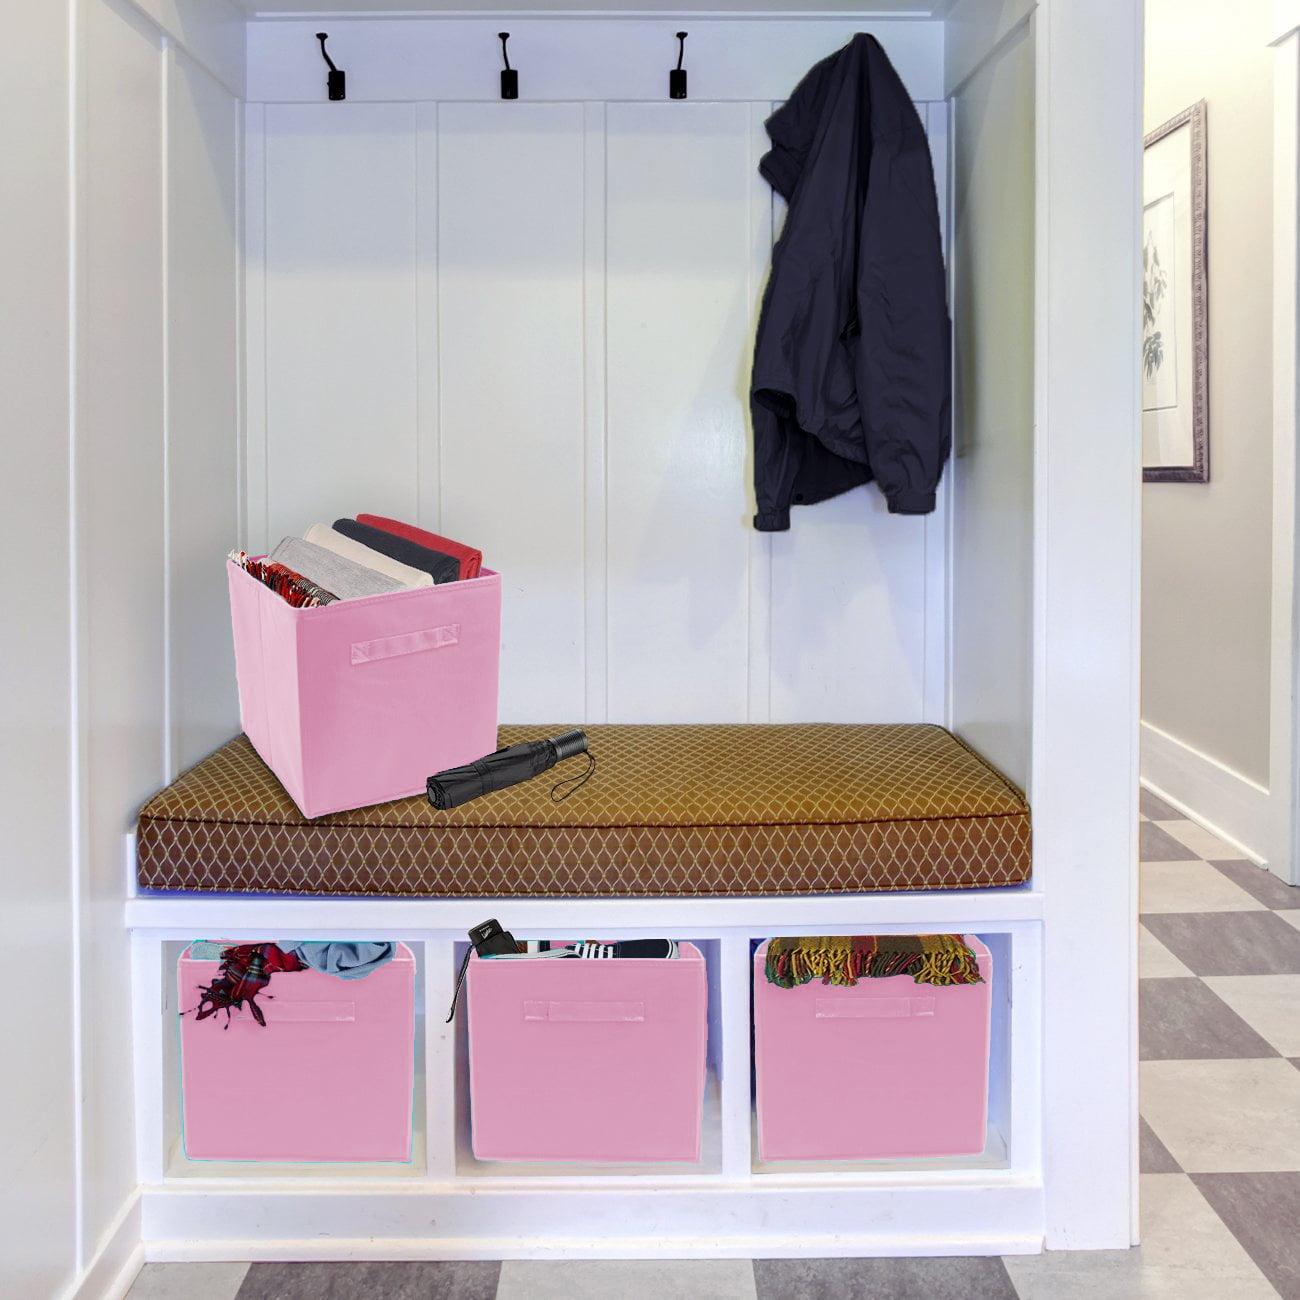 Sorbus Foldable Storage Cube Basket Bin - Great for Nursery, Playroom, Closet, Home Organization (6 Pack)